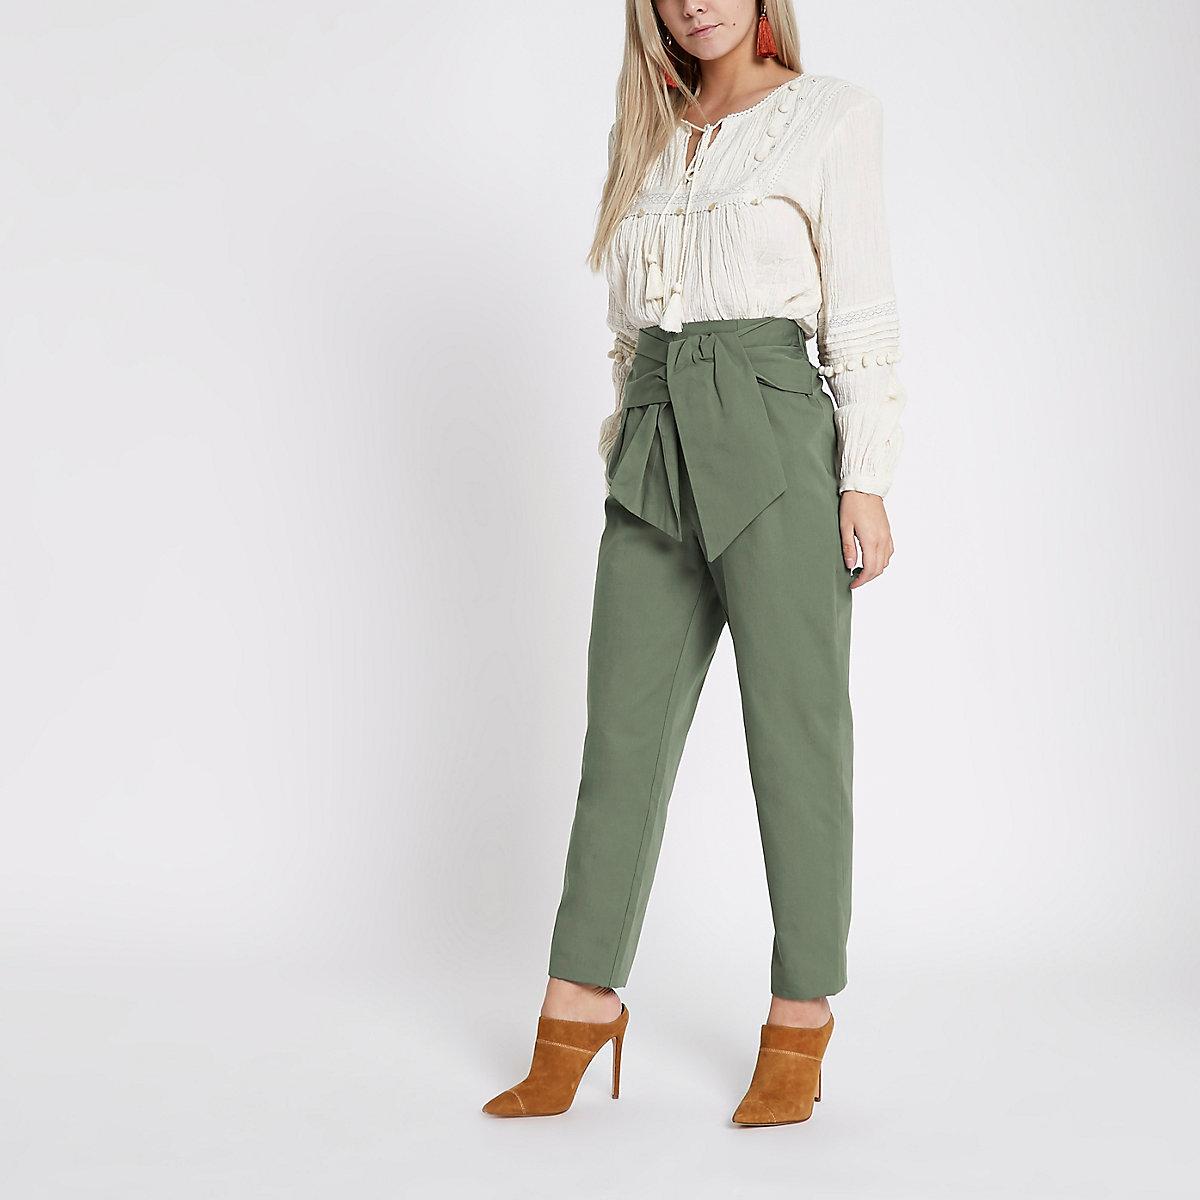 Khaki green tie waist trousers